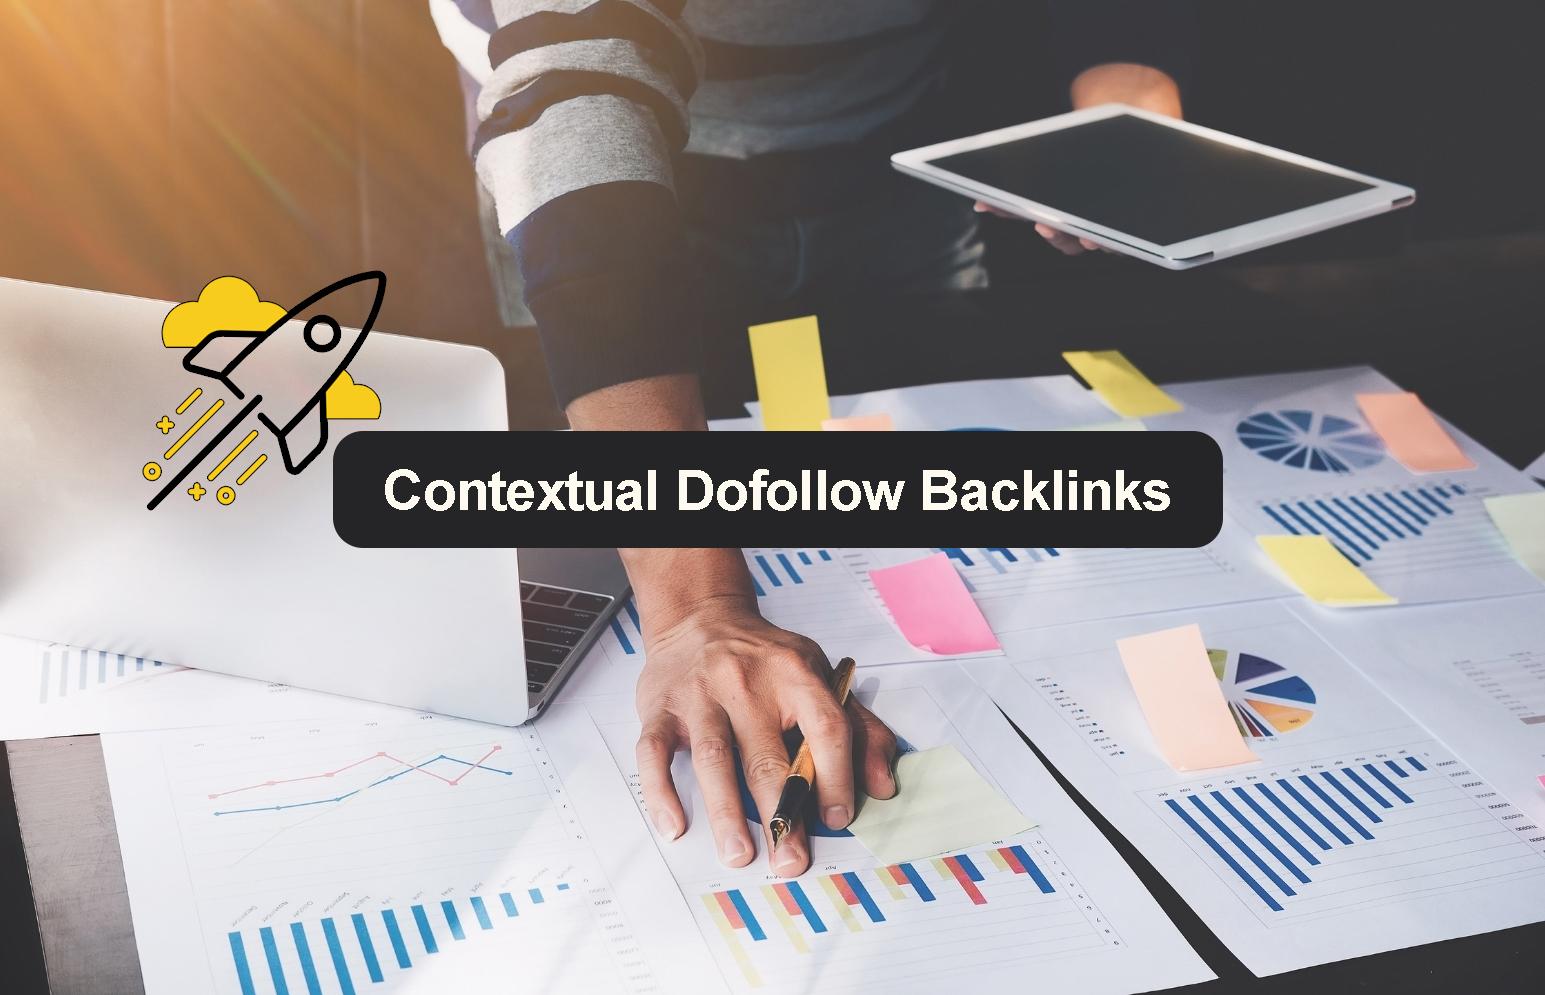 create 1000 high quality contextual dofollow backlinks